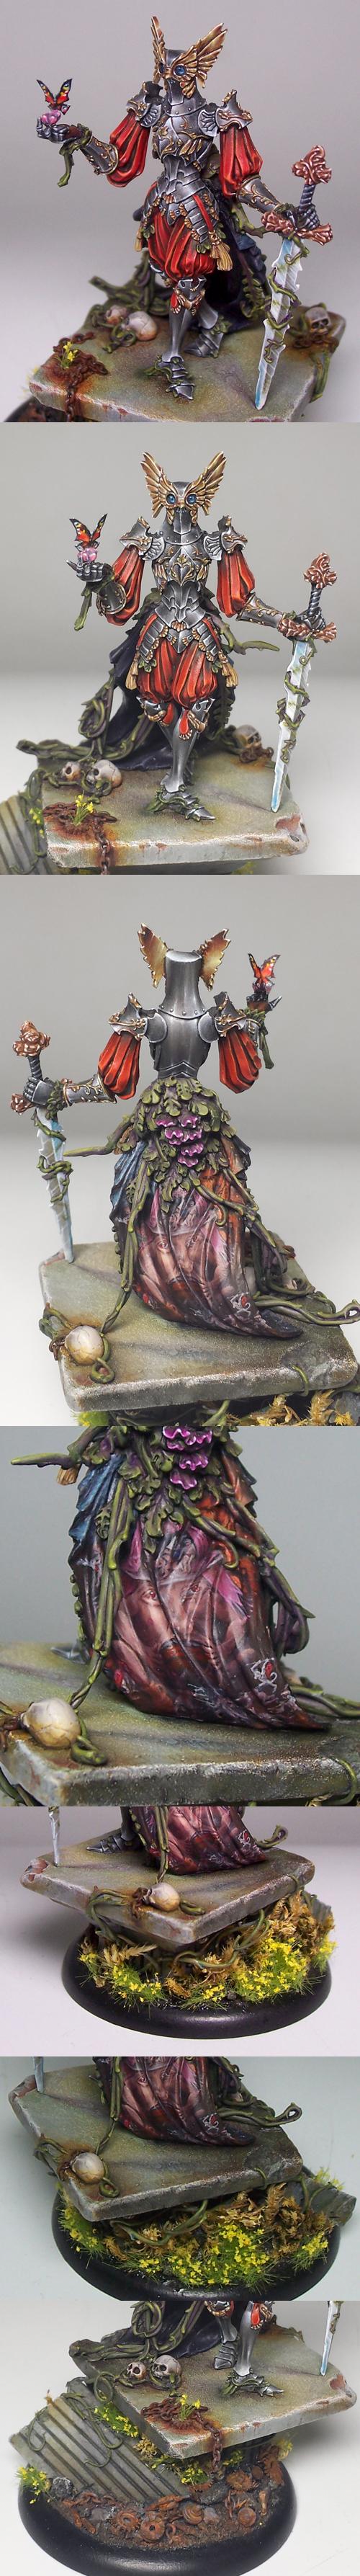 Kingdom Death - Flower Knight close ups